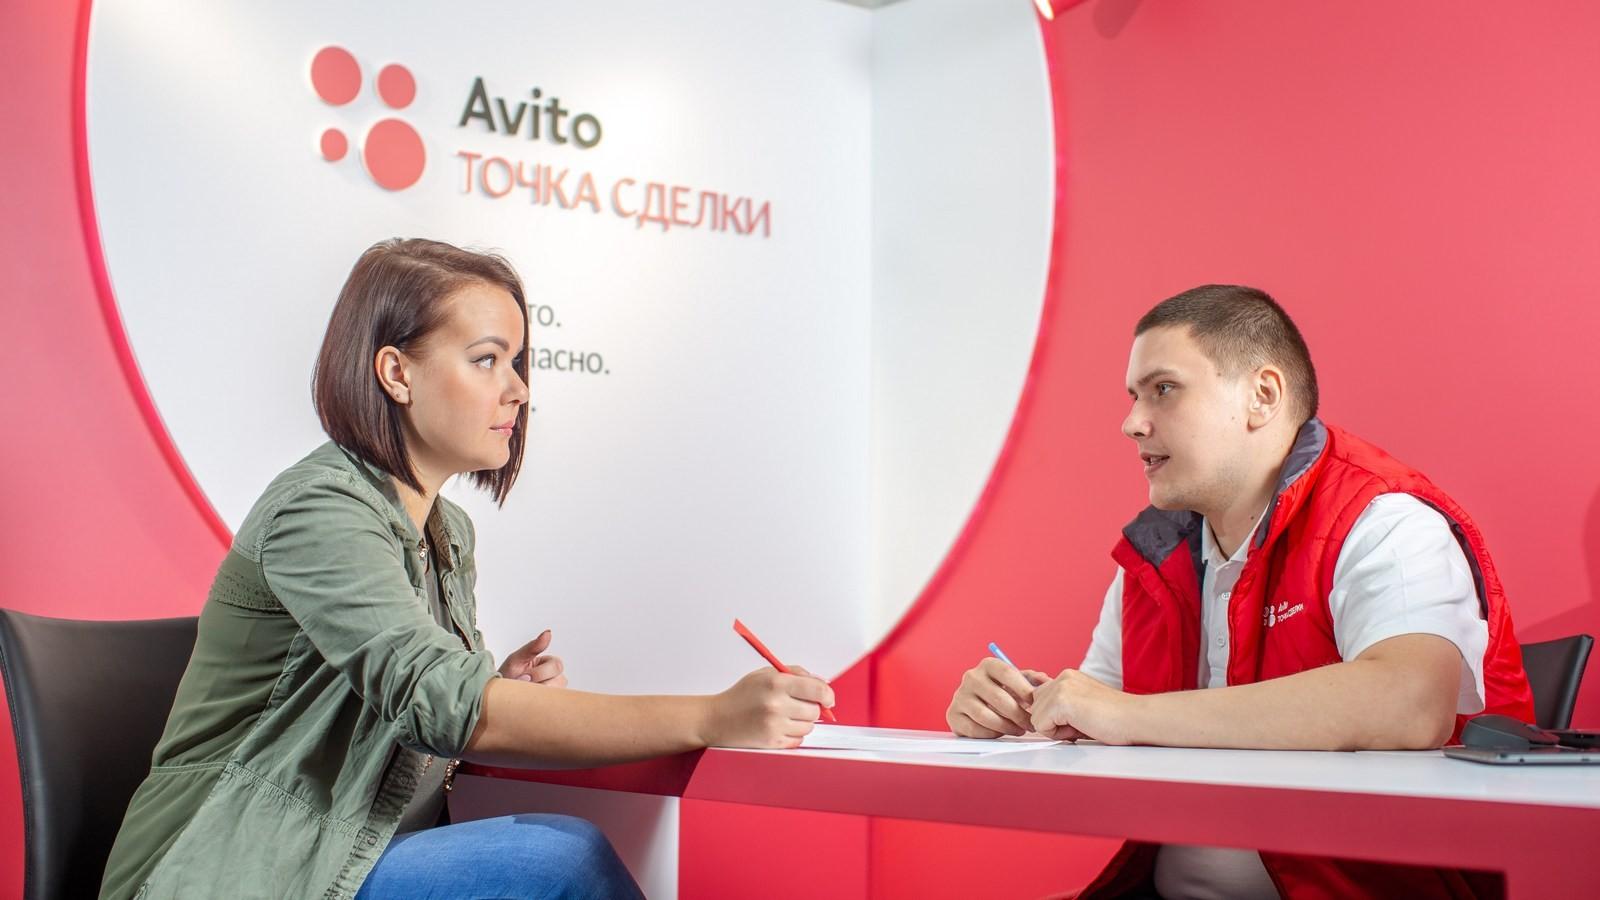 «Avito Авто» «Точка сделки»